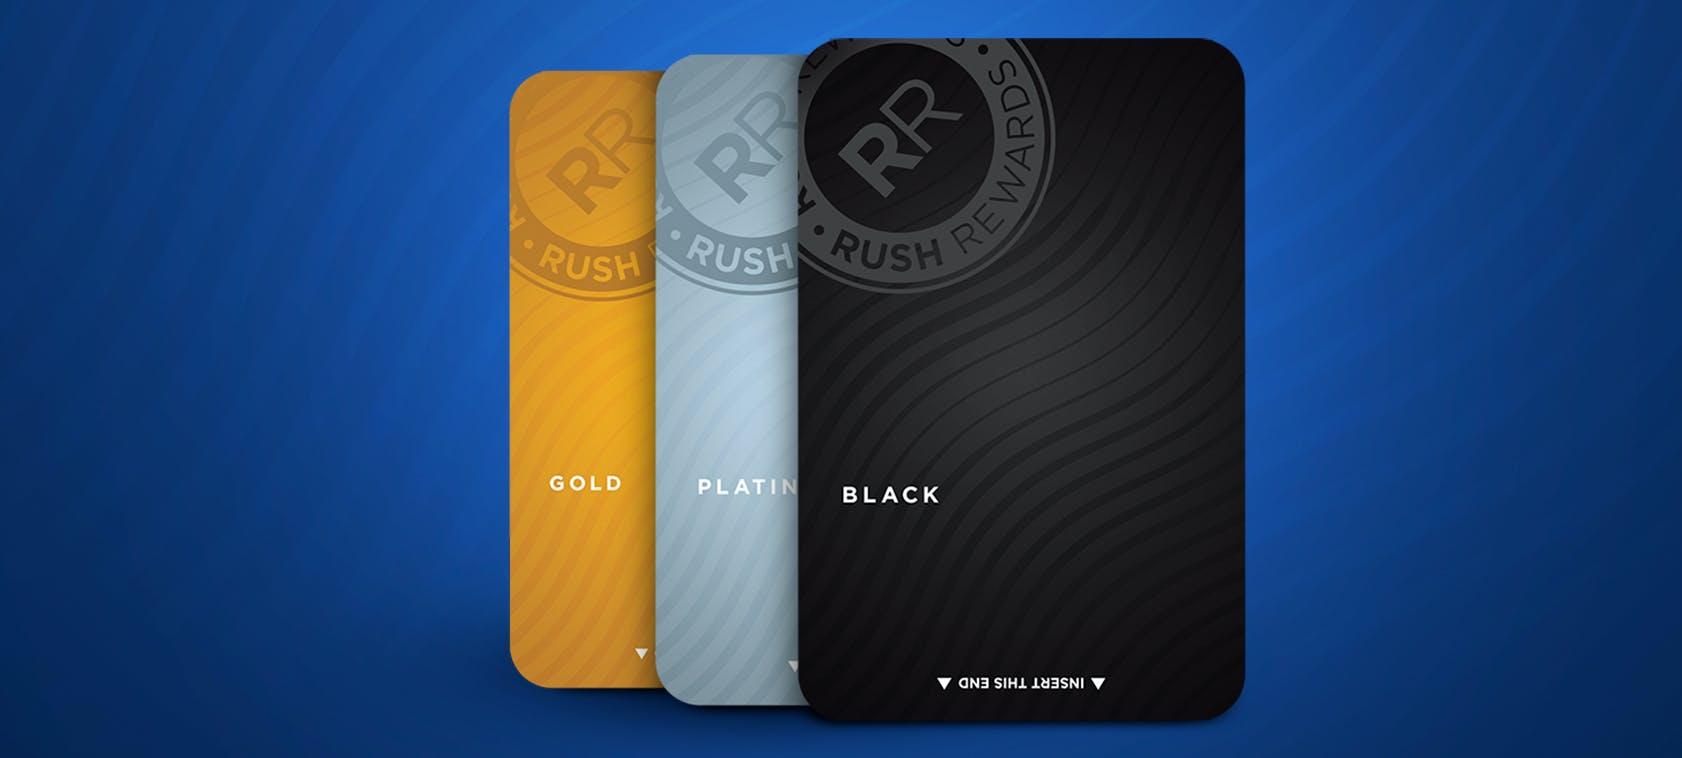 Rush Rewards